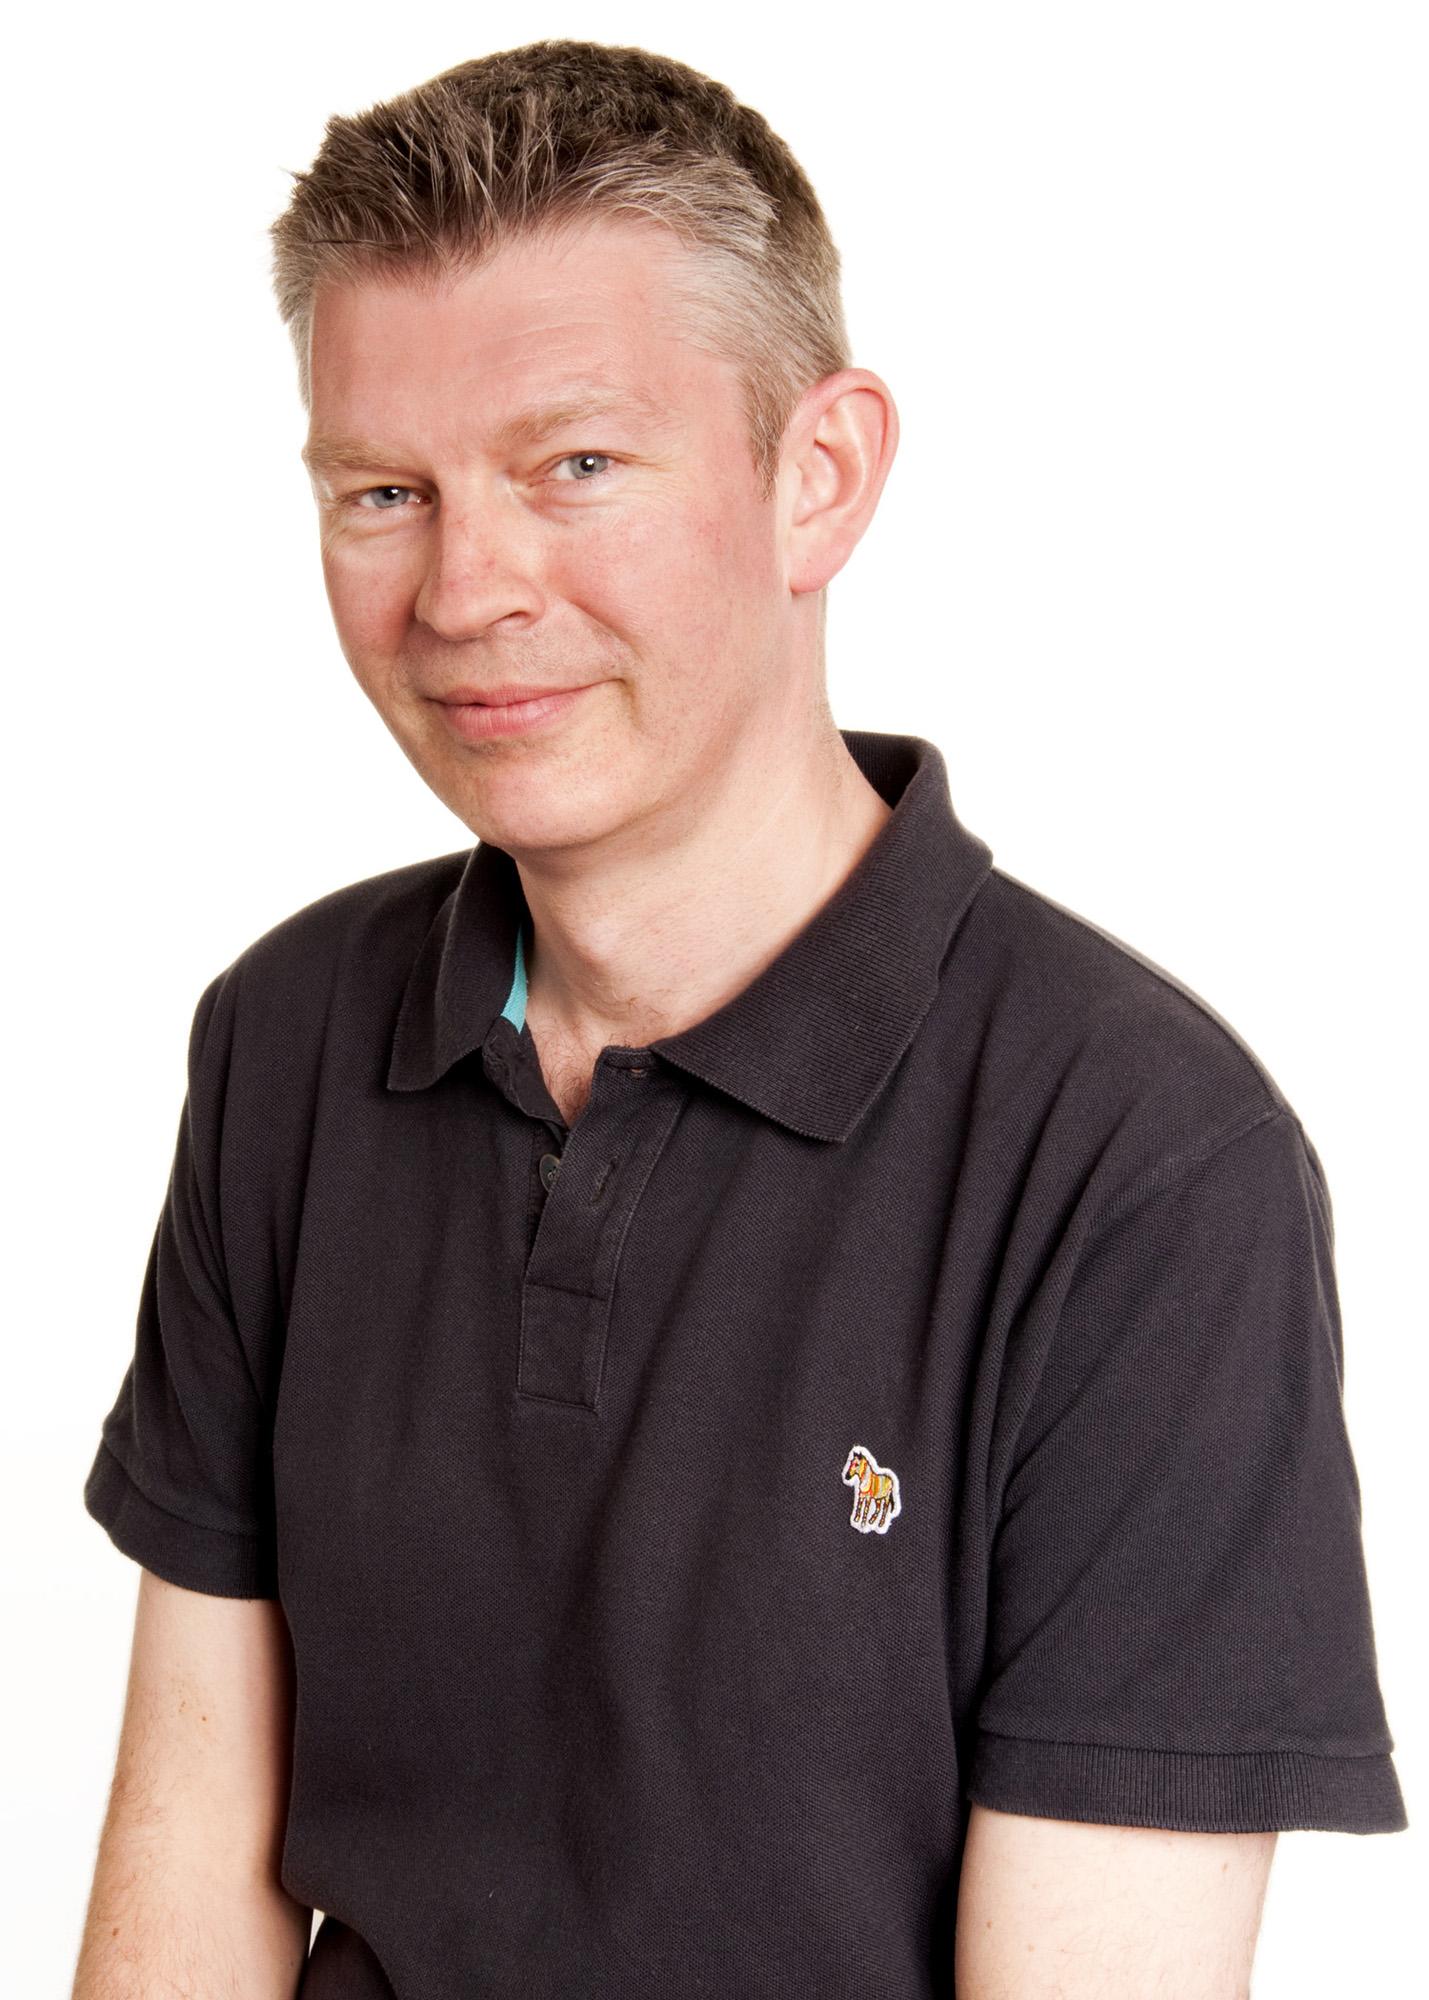 Gareth Inman